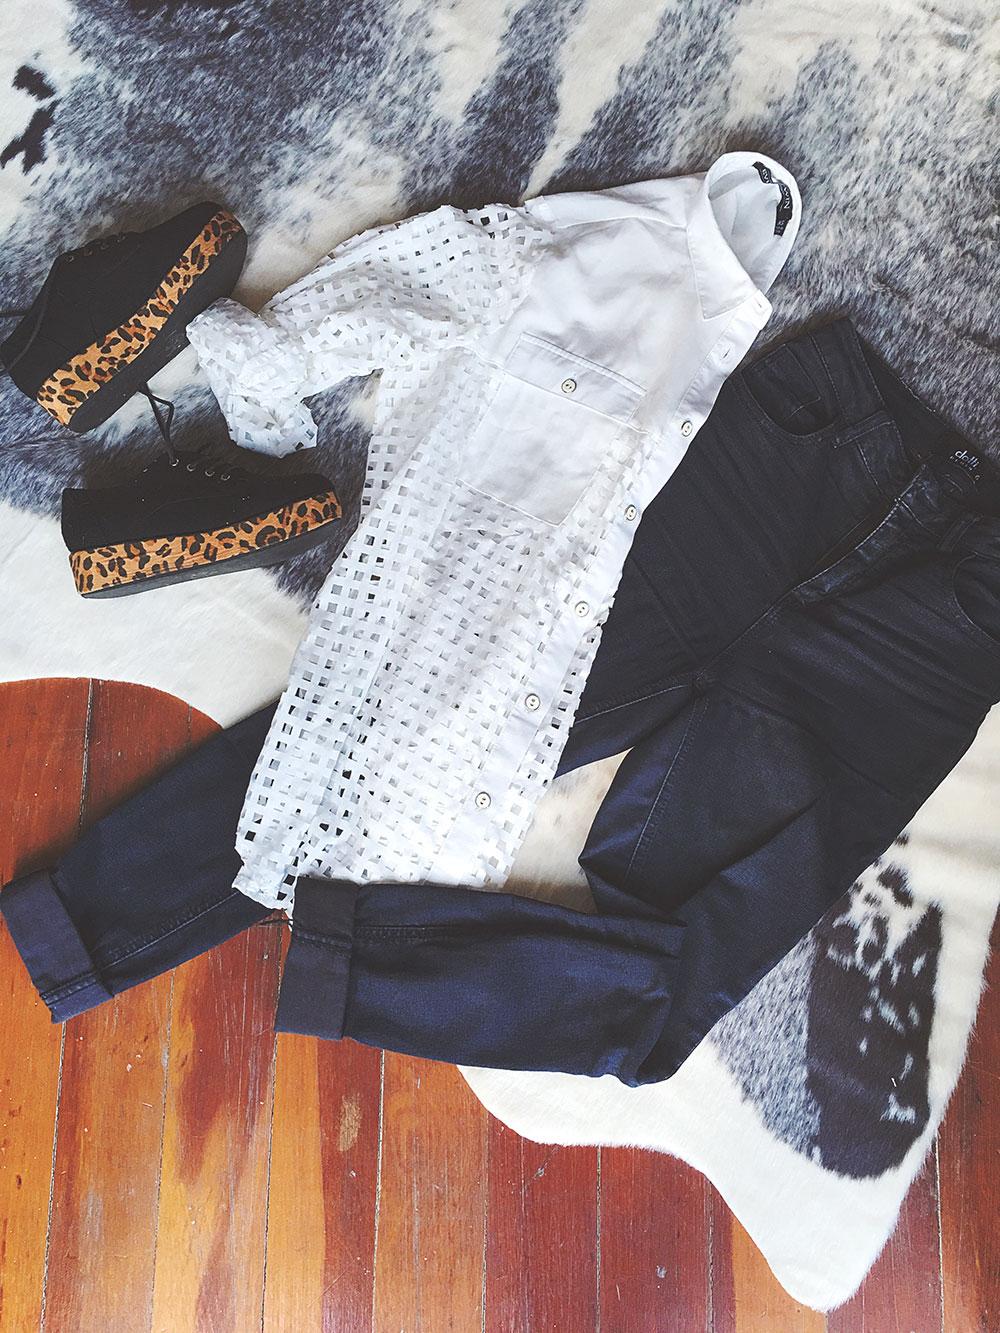 clothes-flatlay.jpg